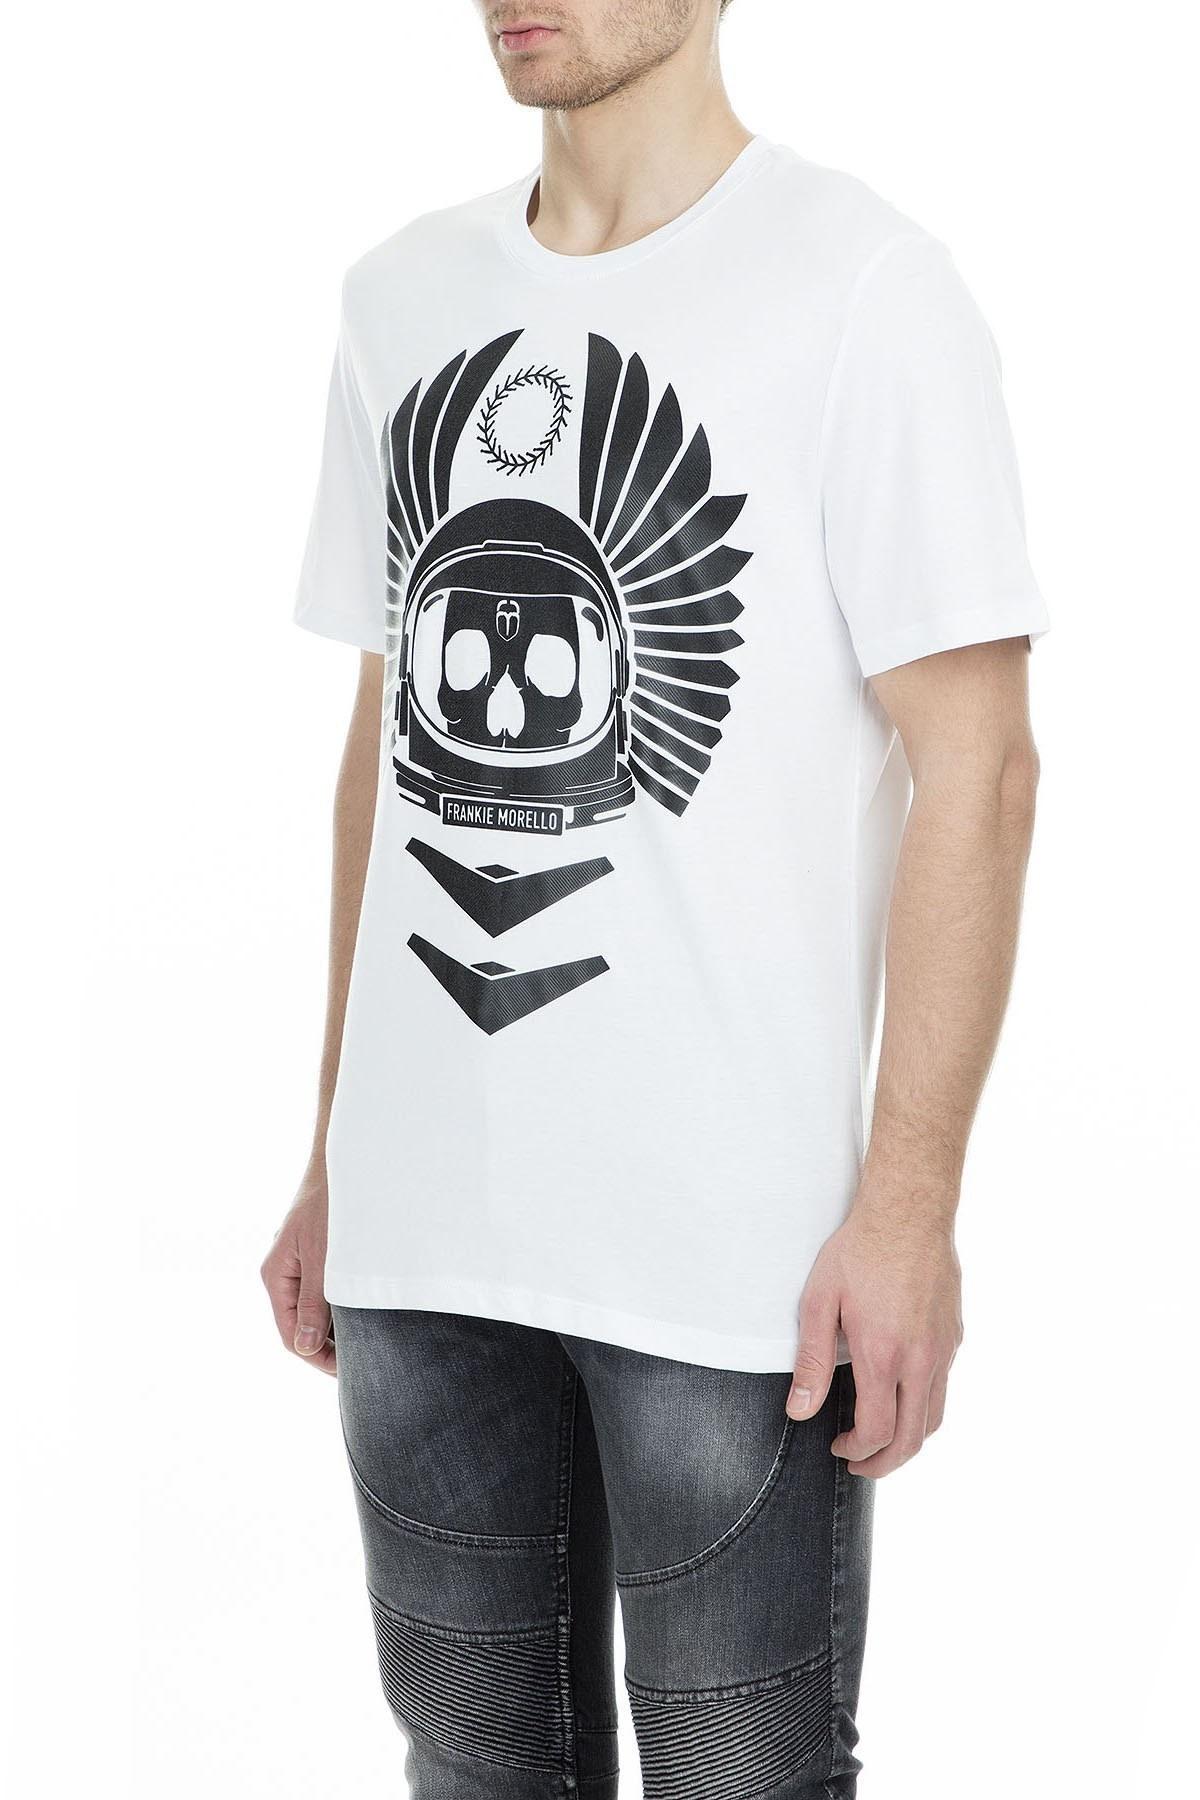 Frankie Morello Erkek T Shirt FMCS9135TS W02 BEYAZ